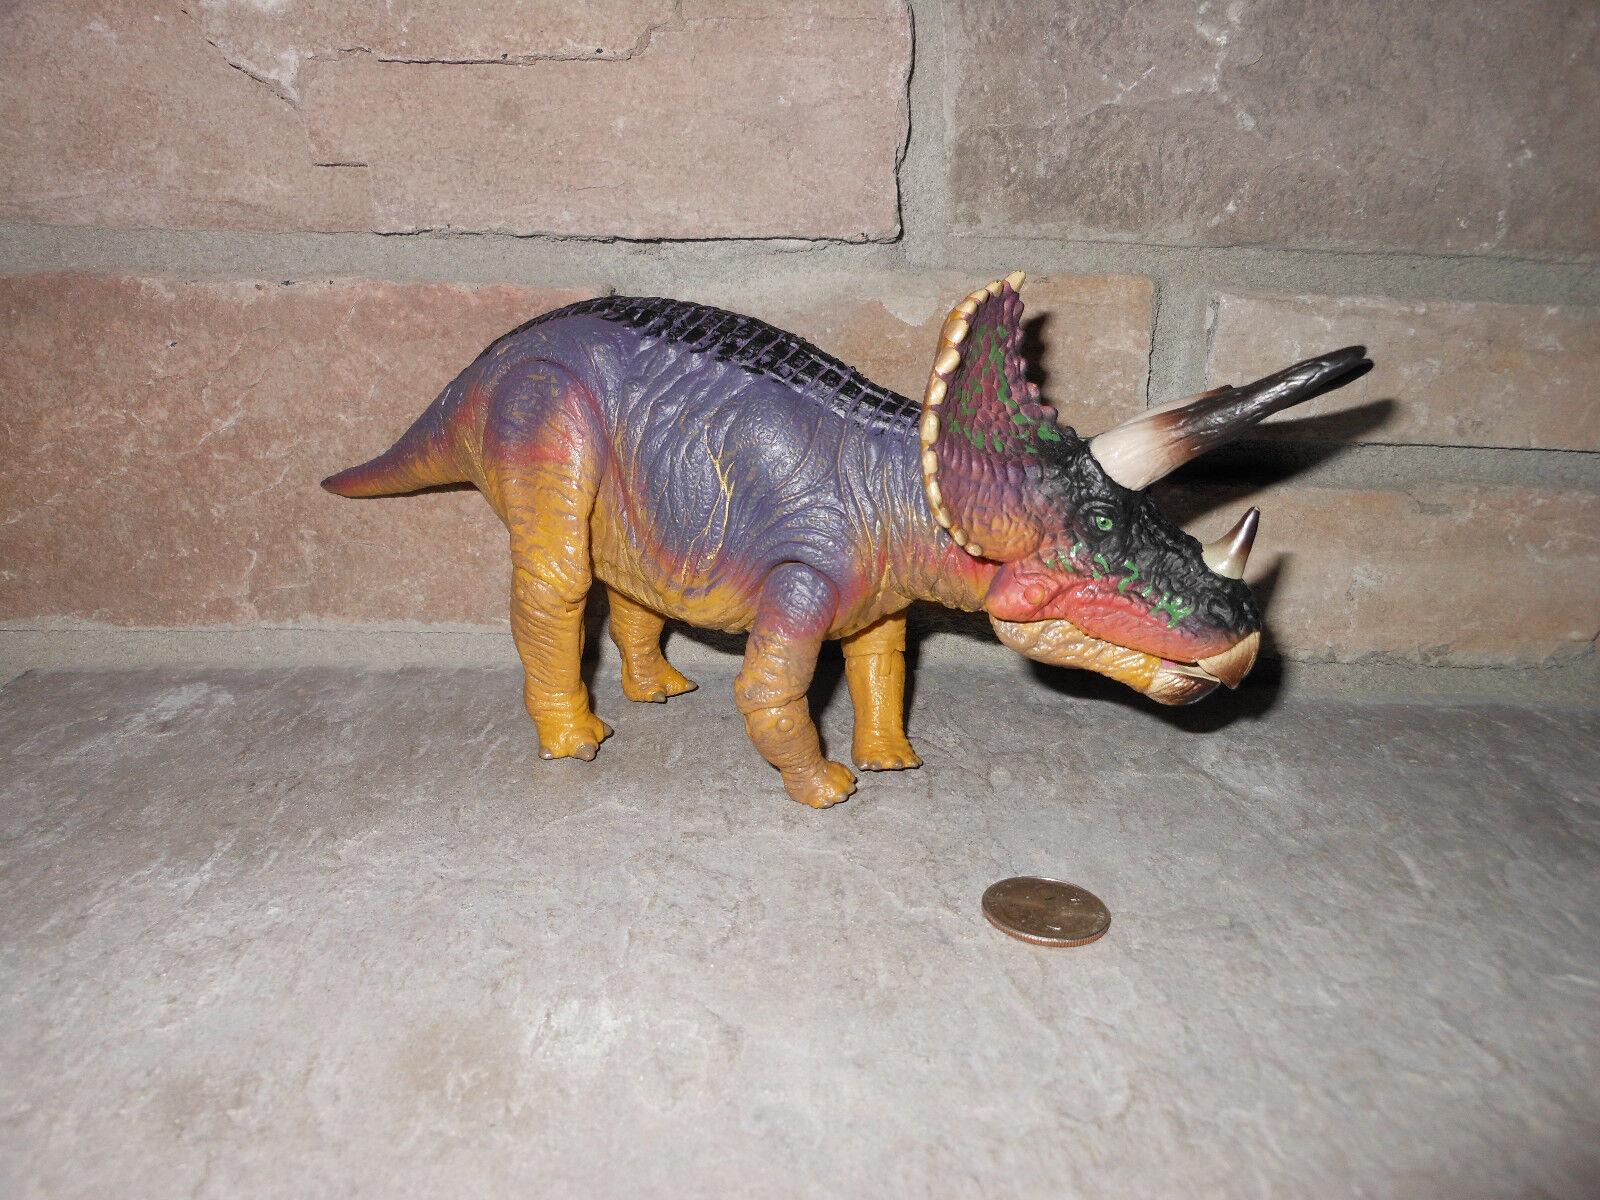 Blautbad resaurus triceratops dinosaurier - figur selten gute form